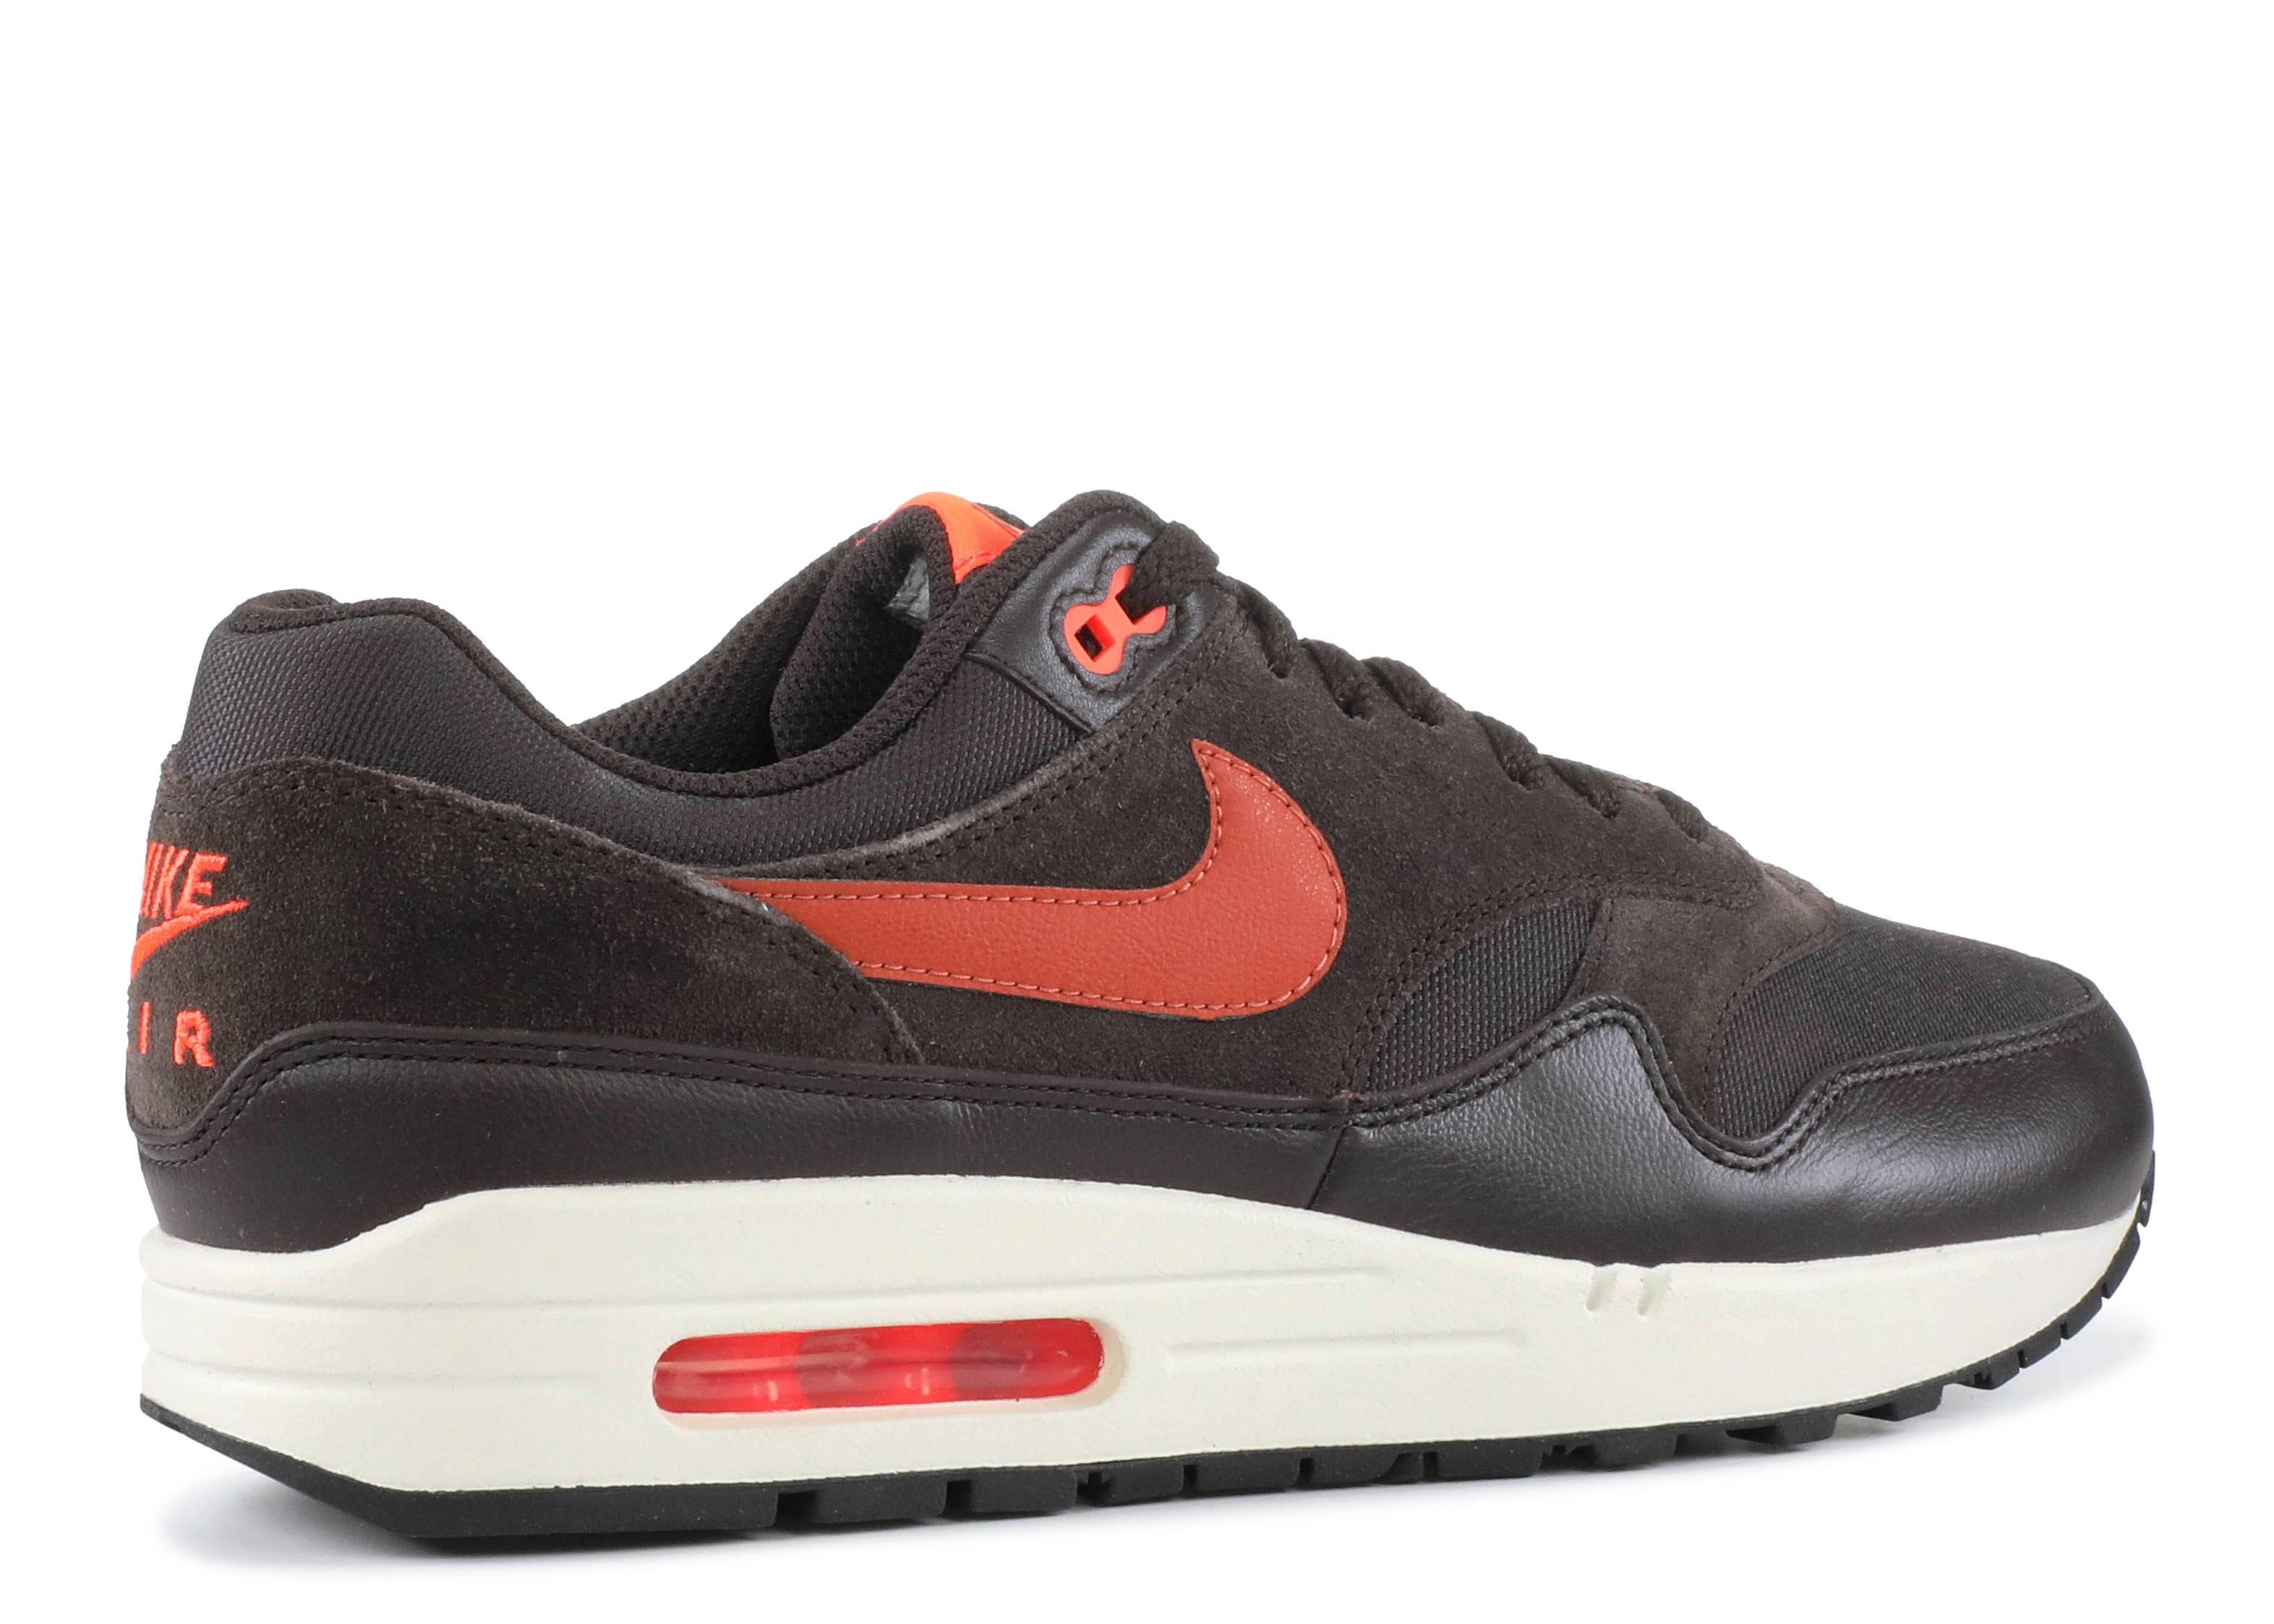 Nike Air Max 95 Khaki Velvet Brown Size 15